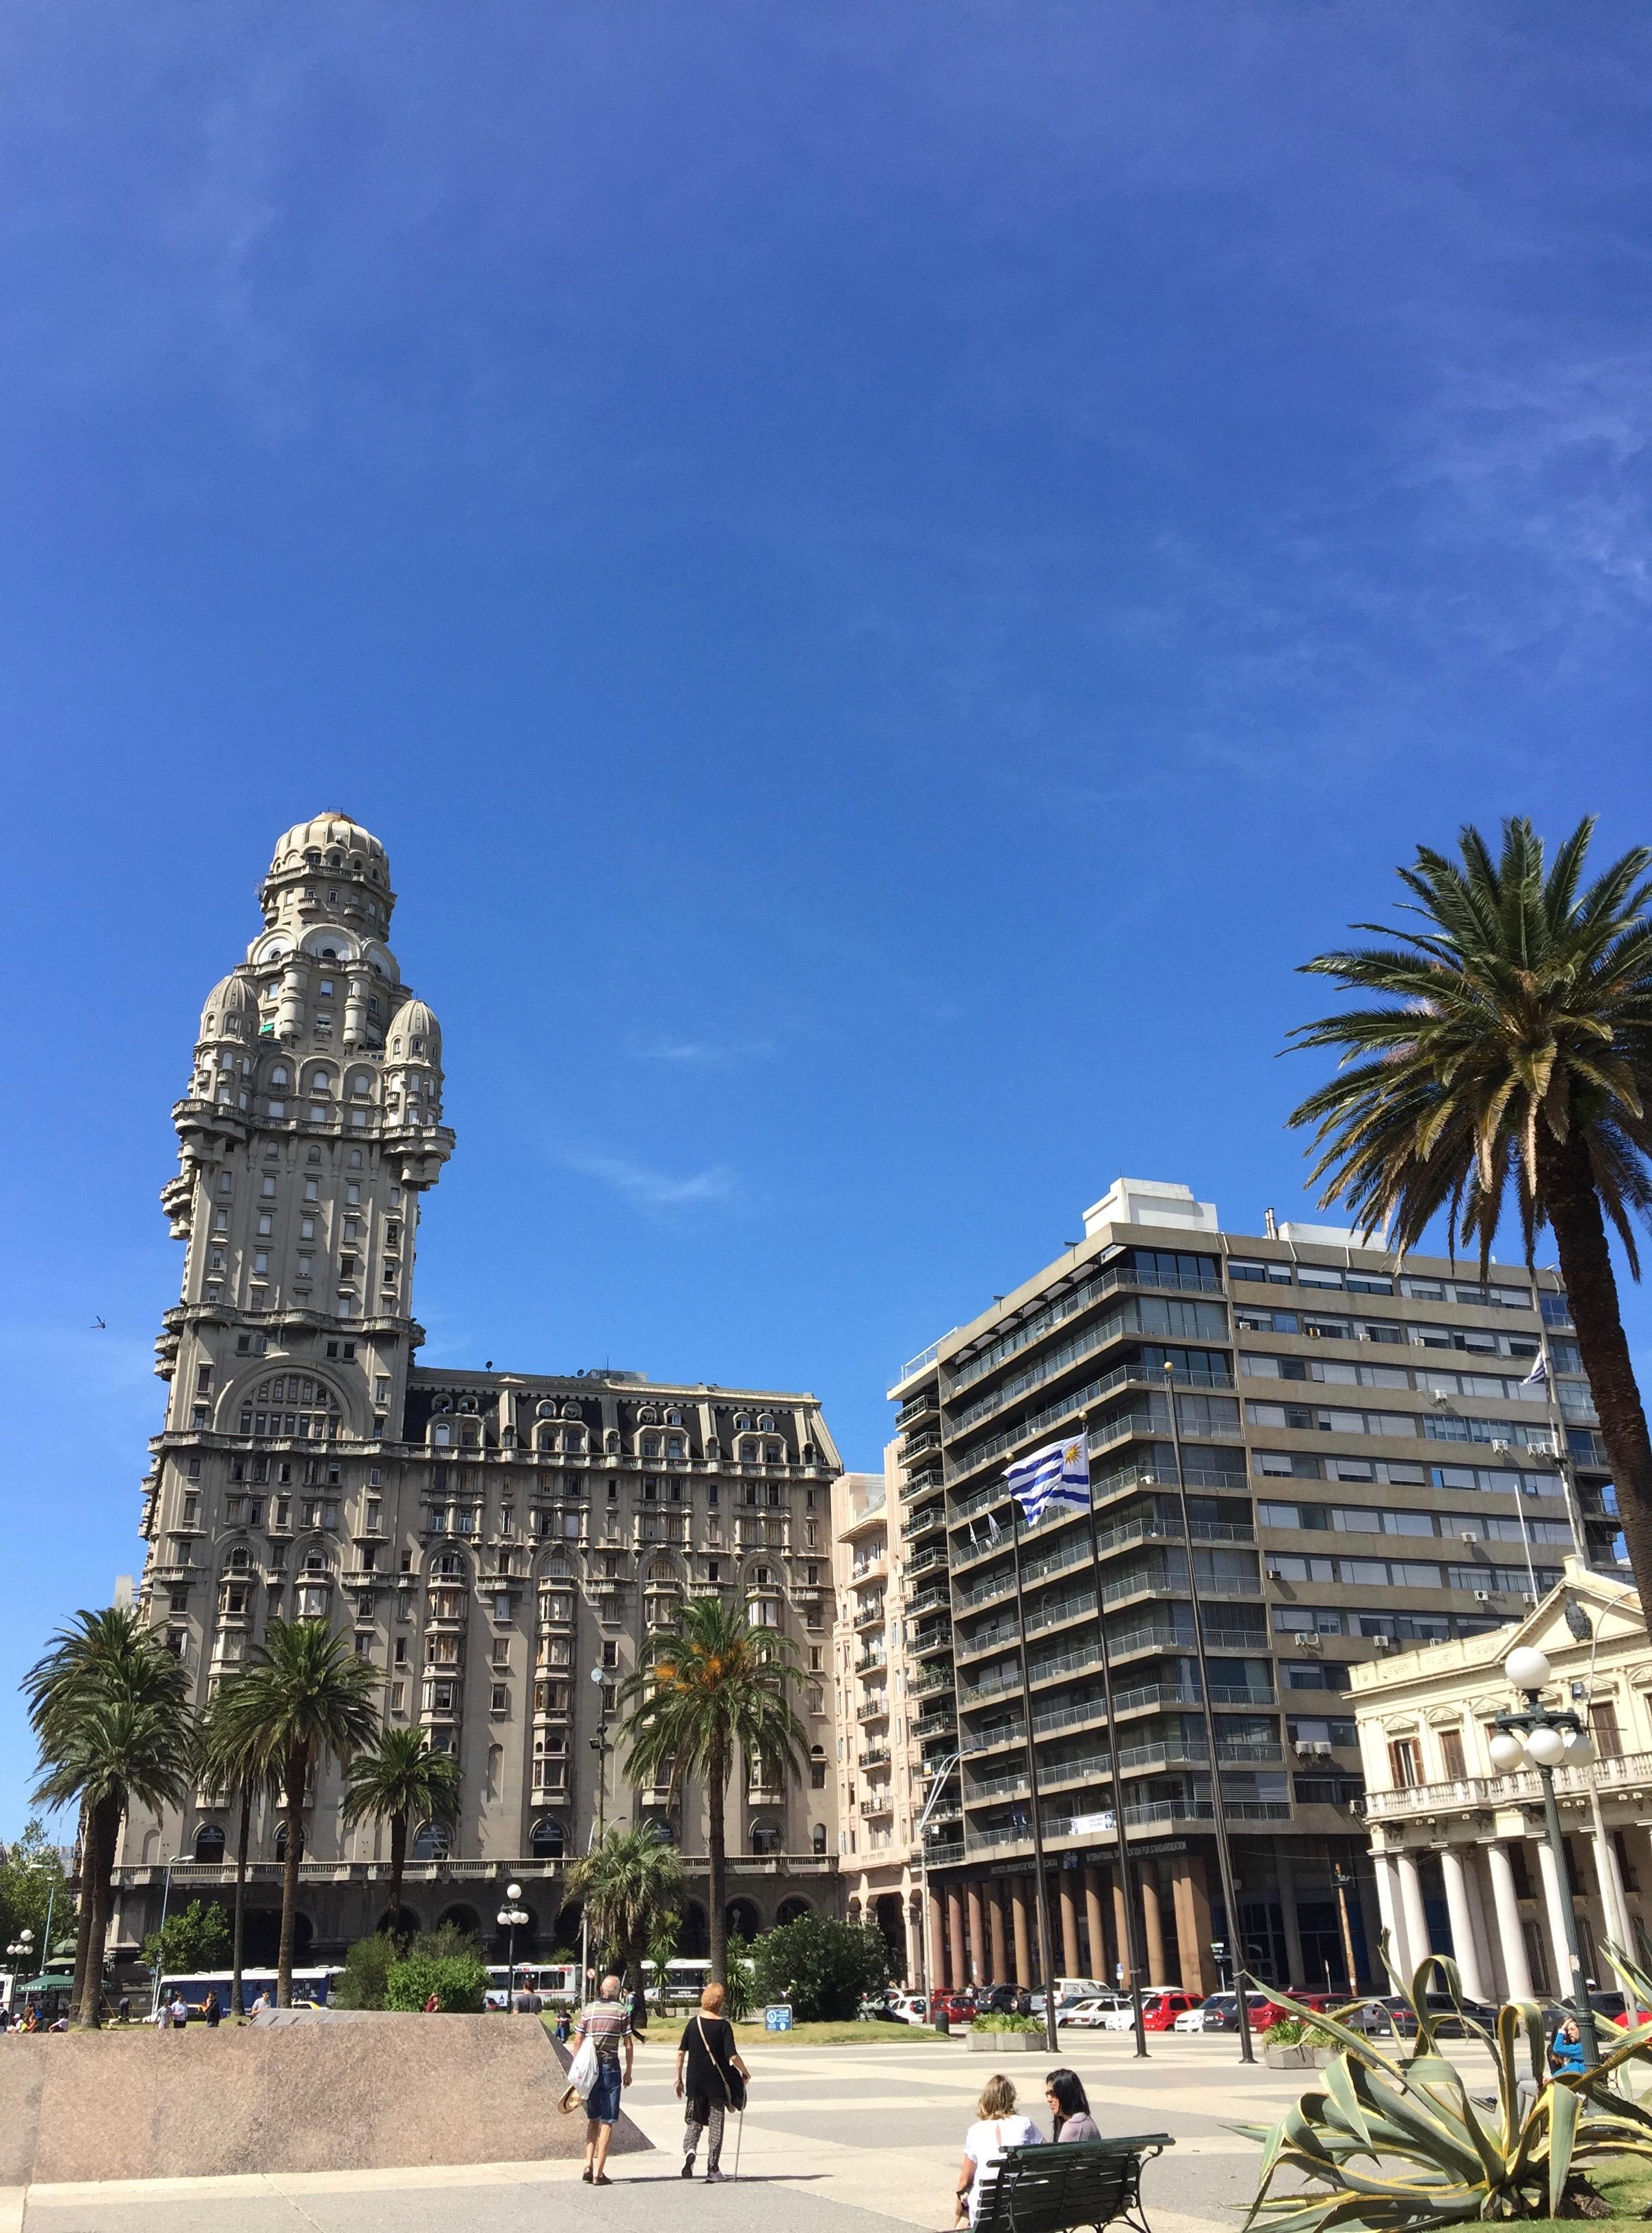 Palacio Salvo in Plaza Independencia